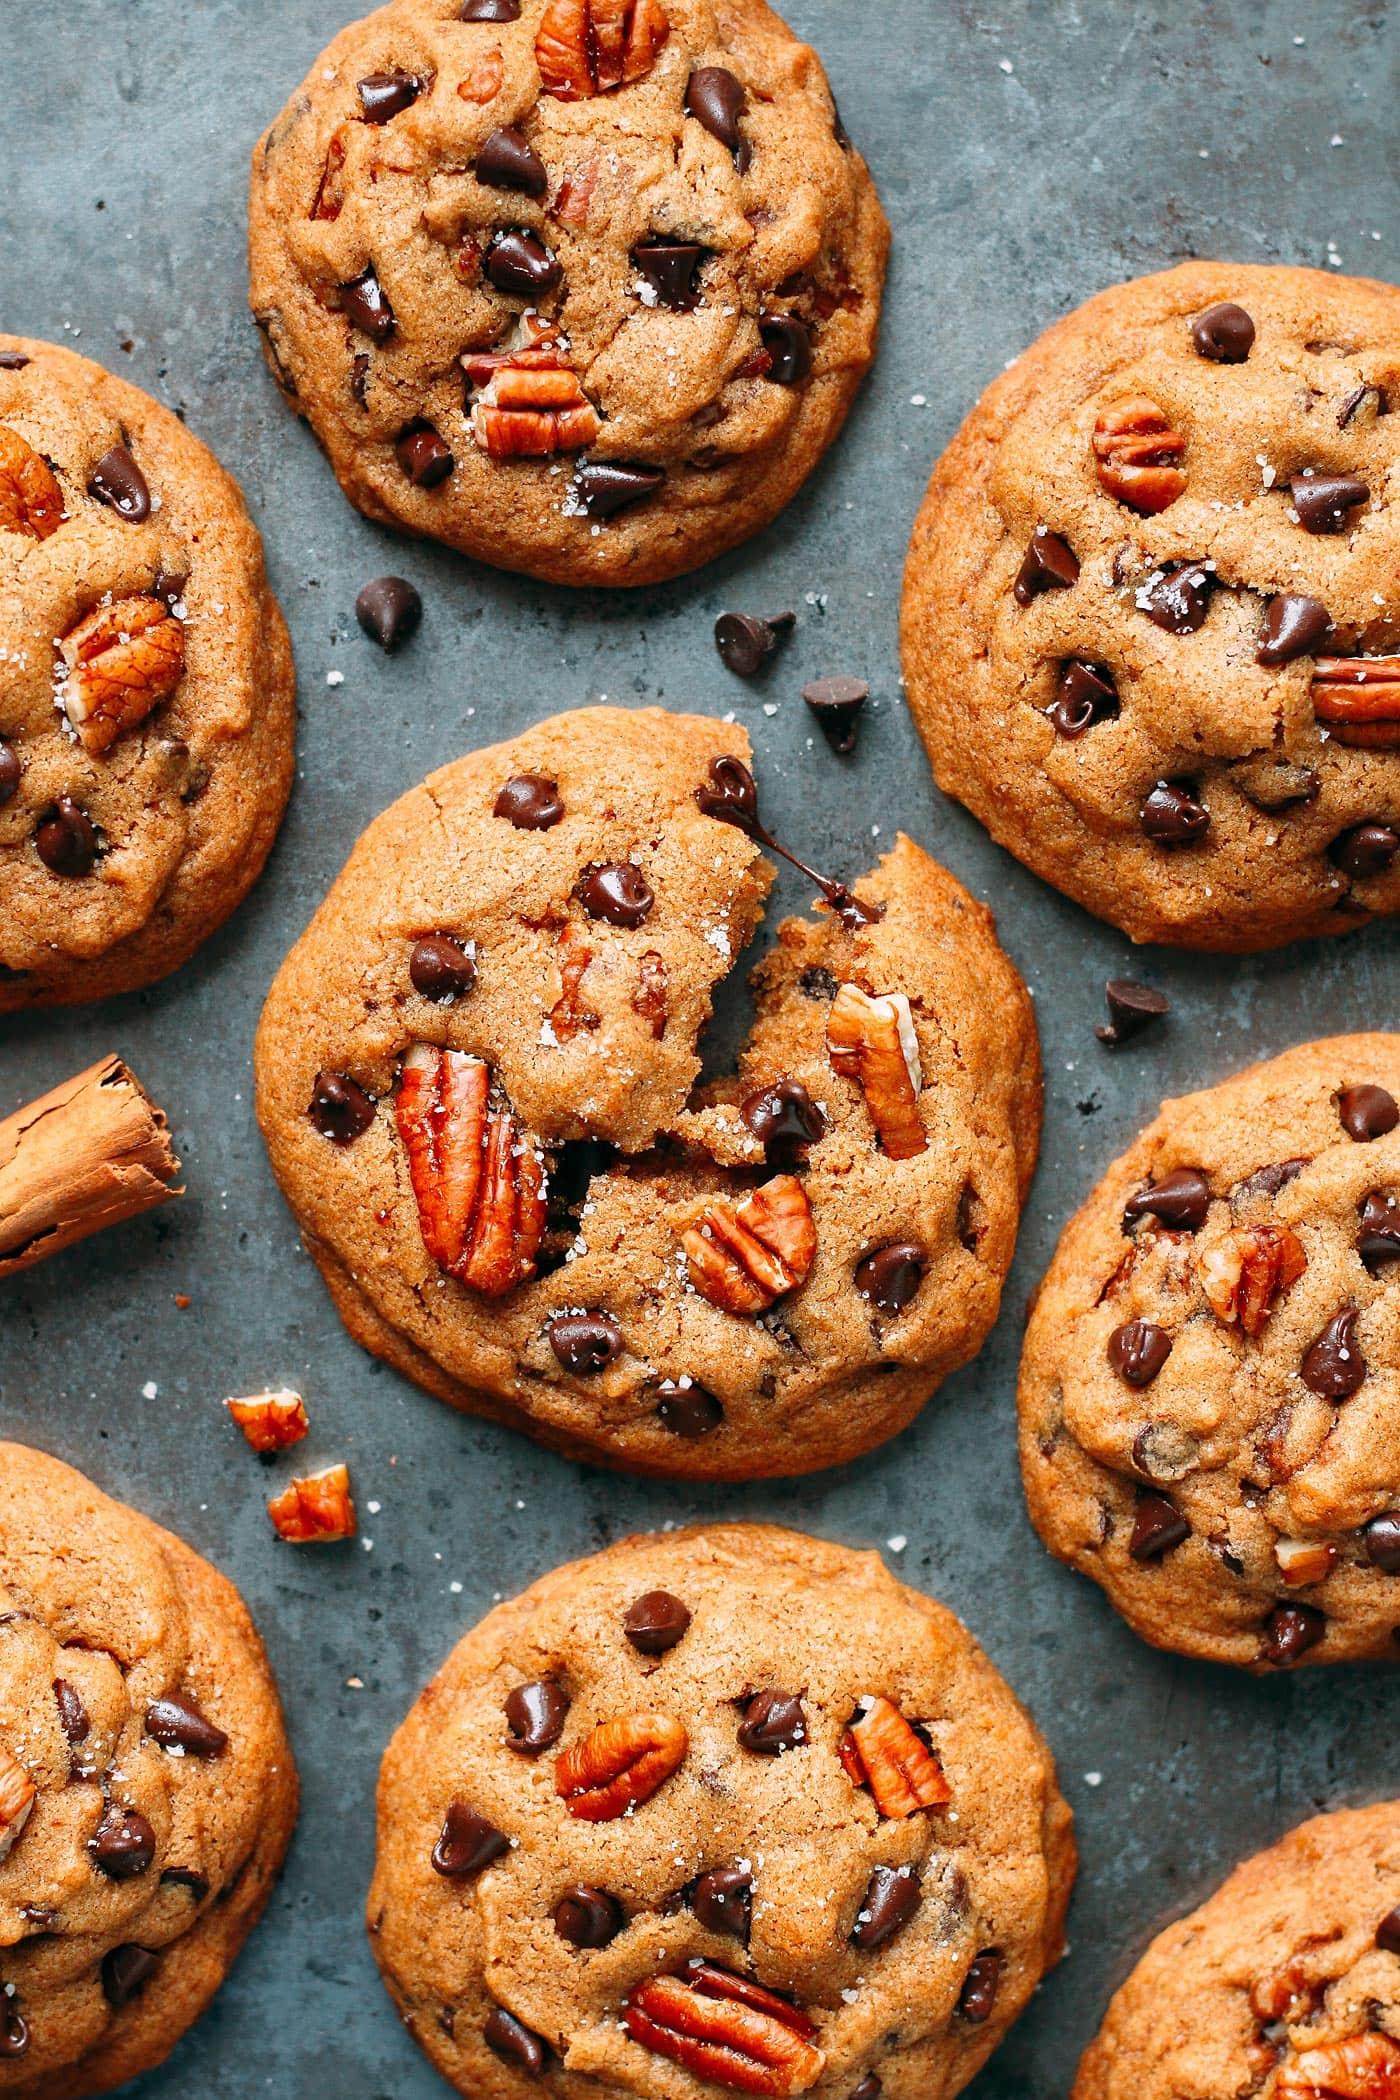 Awesome Pecan Chocolate Chip Cookies (Vegan + GF)